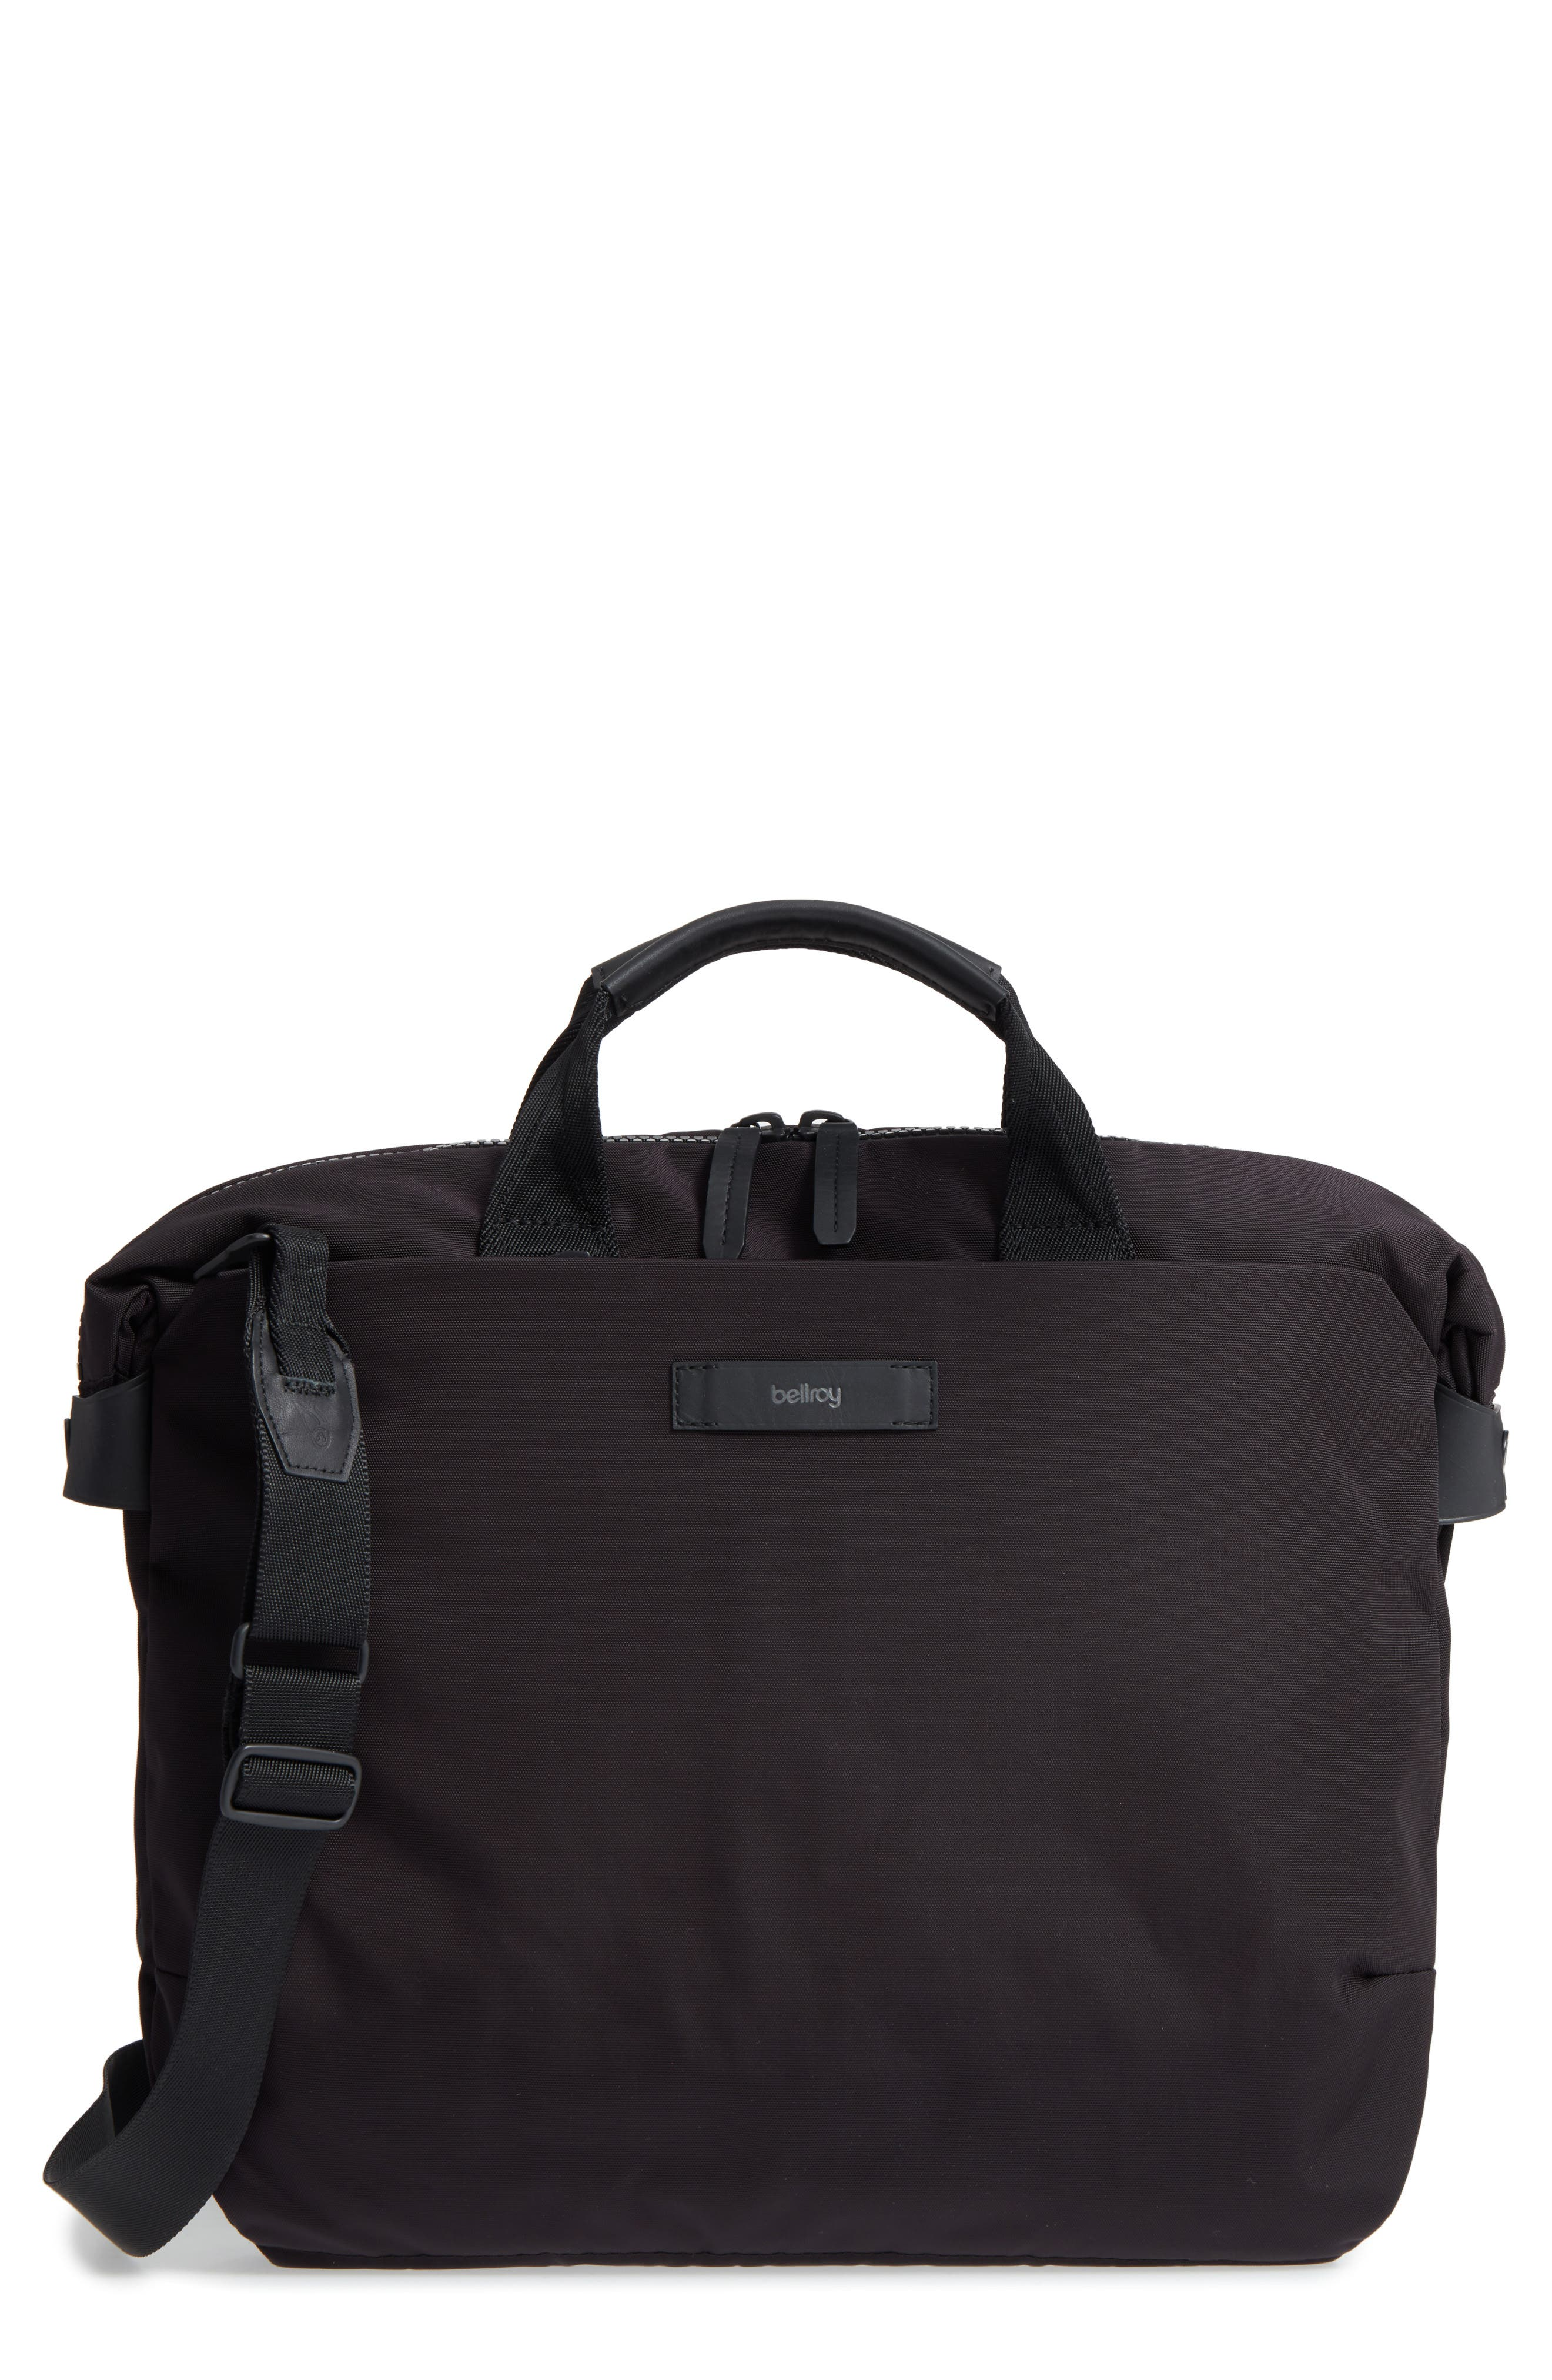 Duo Briefcase,                             Main thumbnail 1, color,                             Black